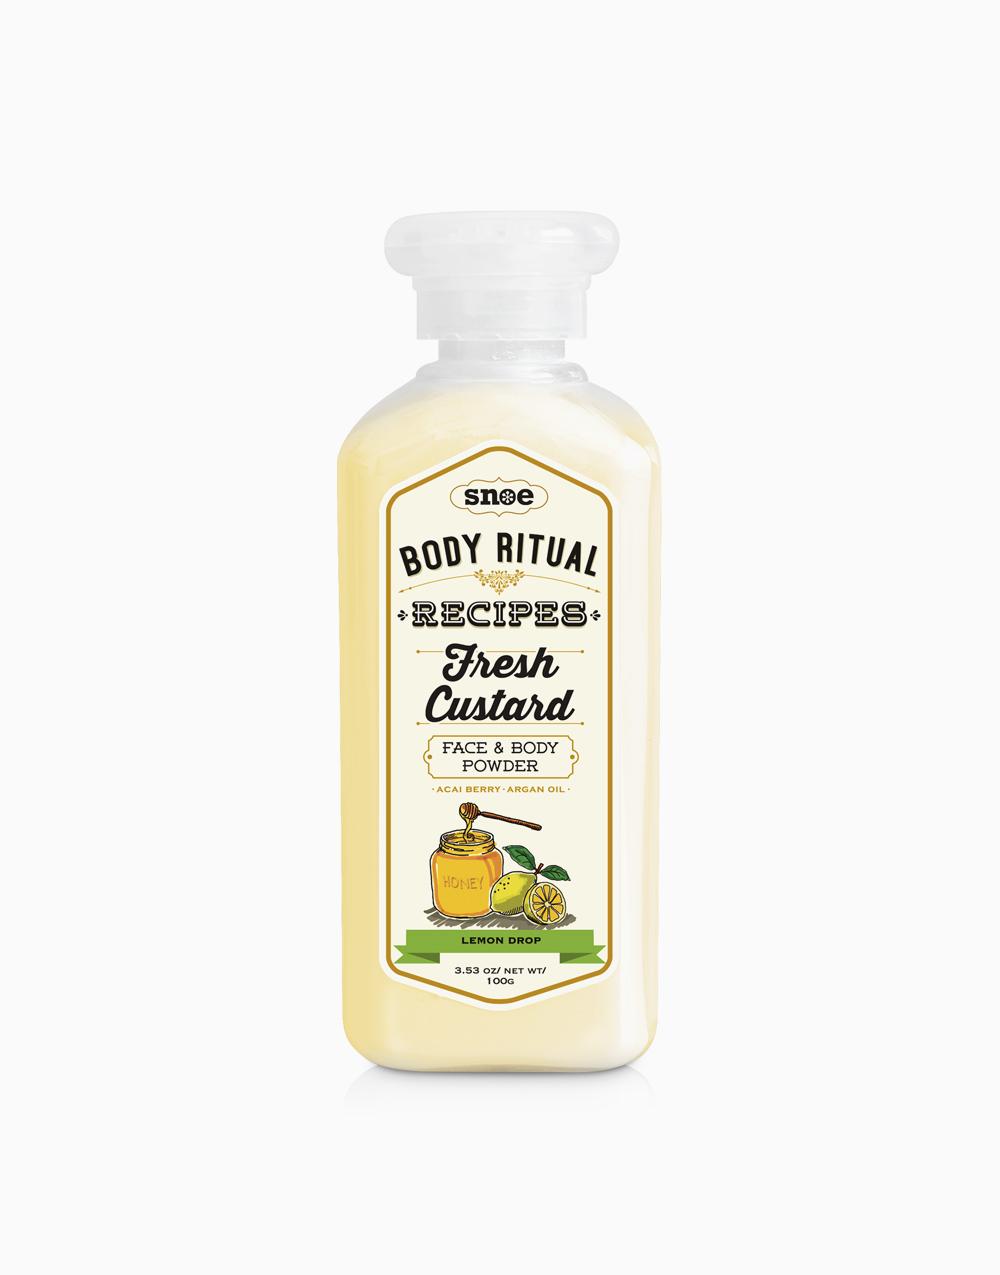 Body Ritual Recipes Fresh Custard Powder by Snoe Beauty   Lemon Drop